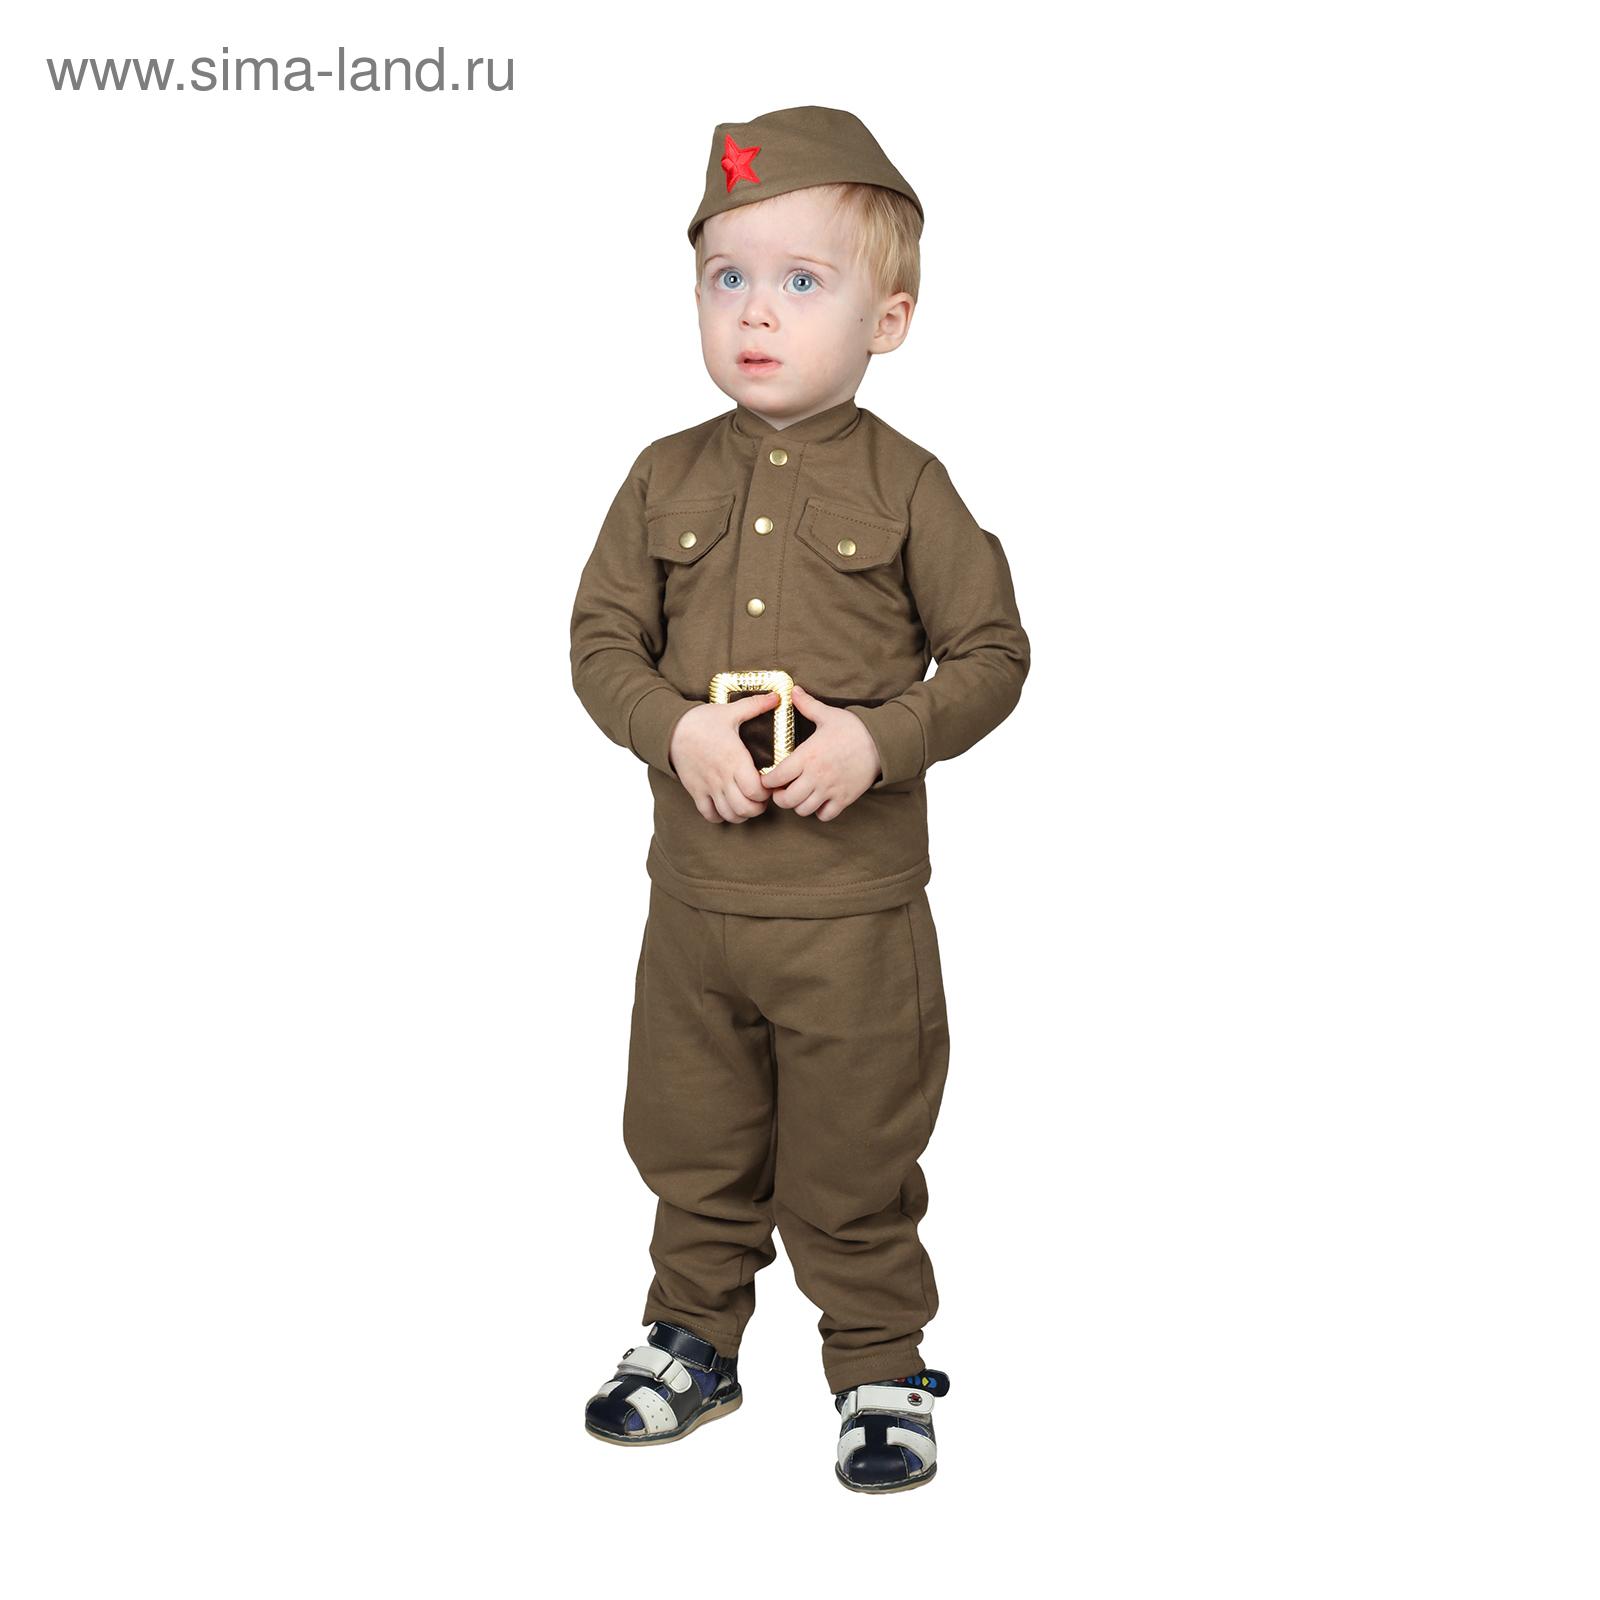 Костюм военного для мальчика  гимнастёрка, галифе, пилотка, трикотаж,  хлопок 100% 59b33b70802